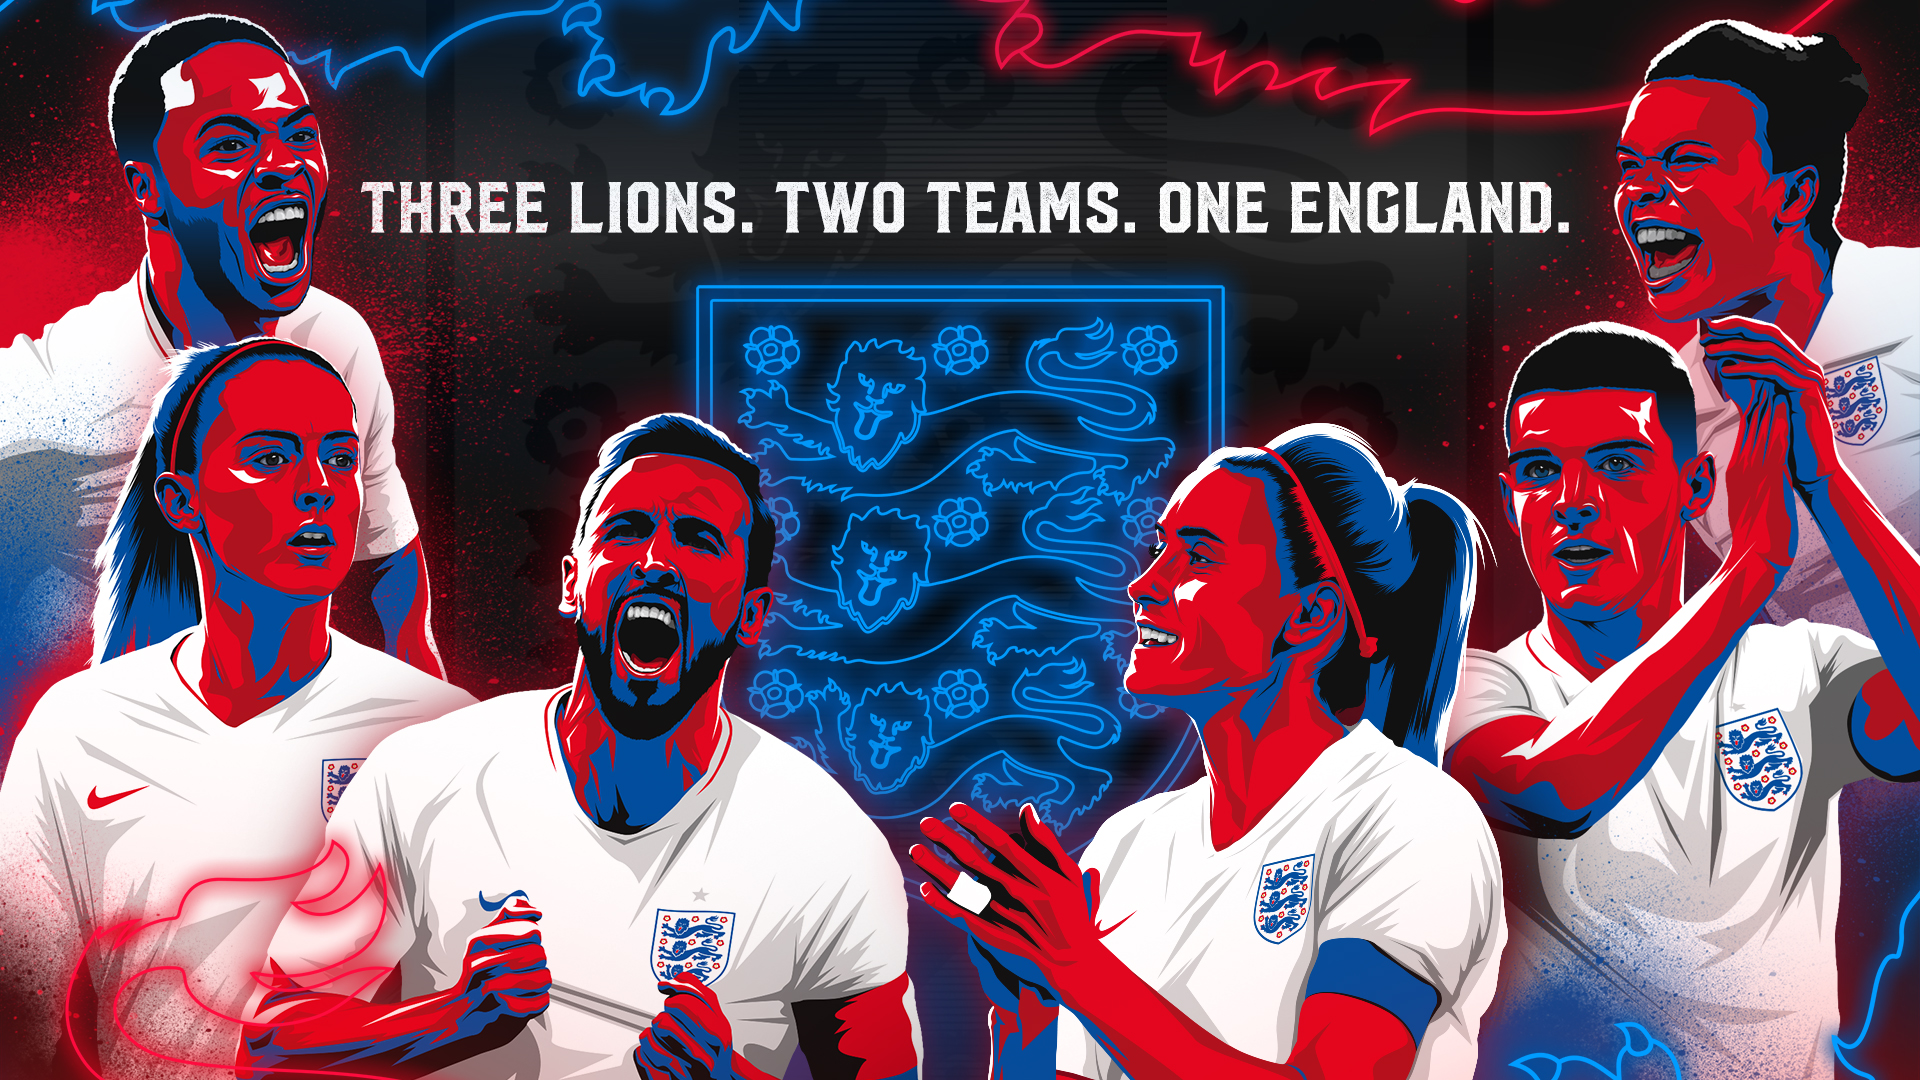 England 3 Lions 2 Teams 1 England 1920x1080